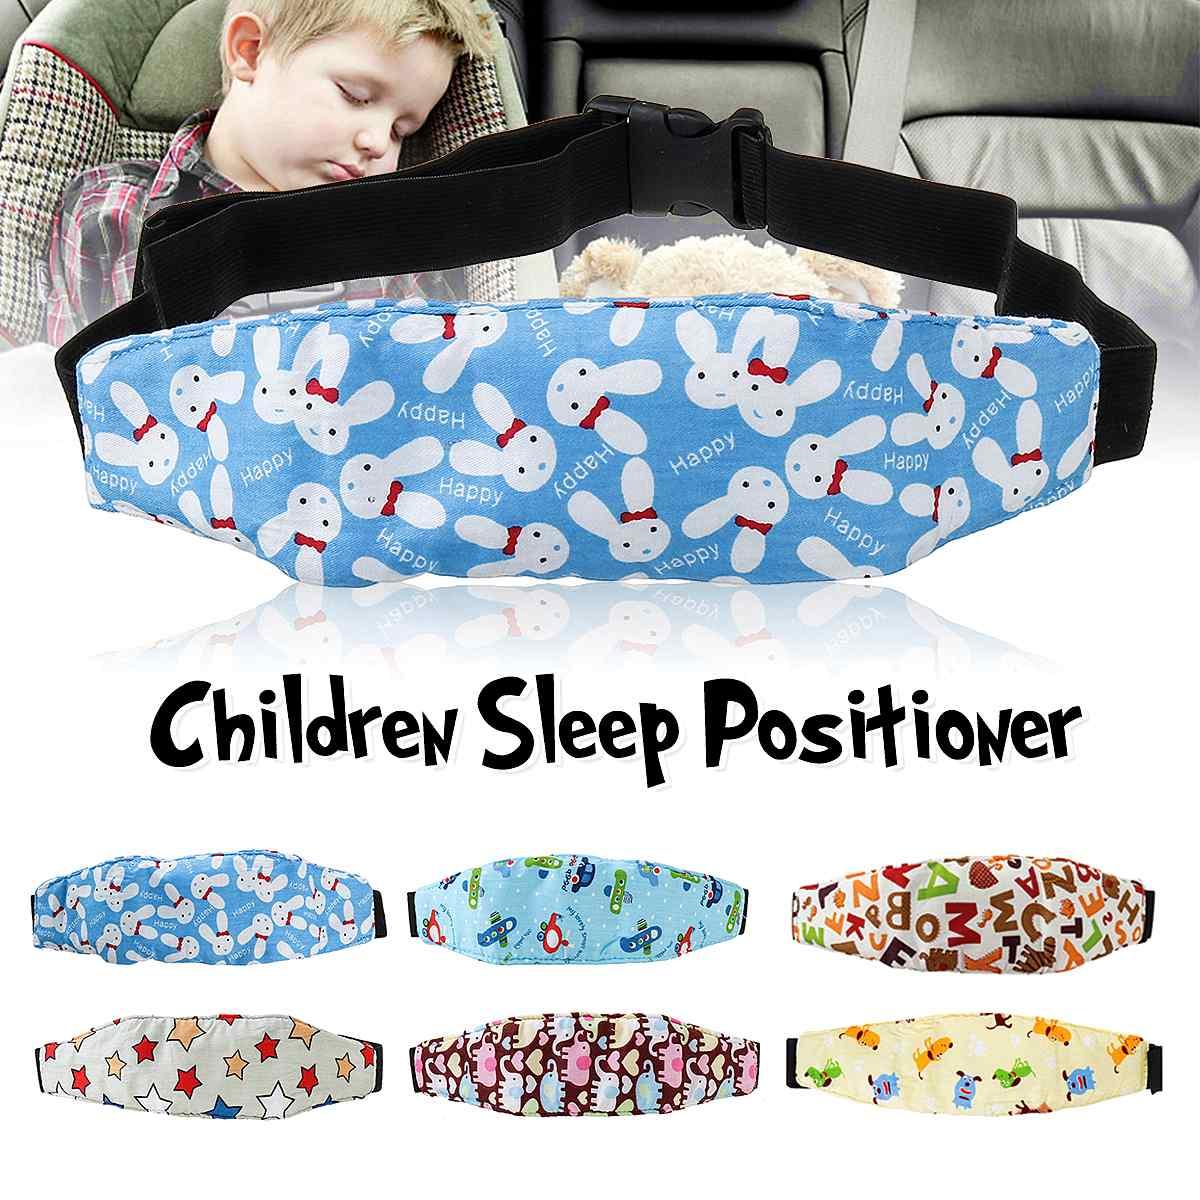 Car Seat Head Support Infant Baby Children Safety Seat Fastening Belt Adjustable Playpens Sleep Positioner Baby Safety Pillow